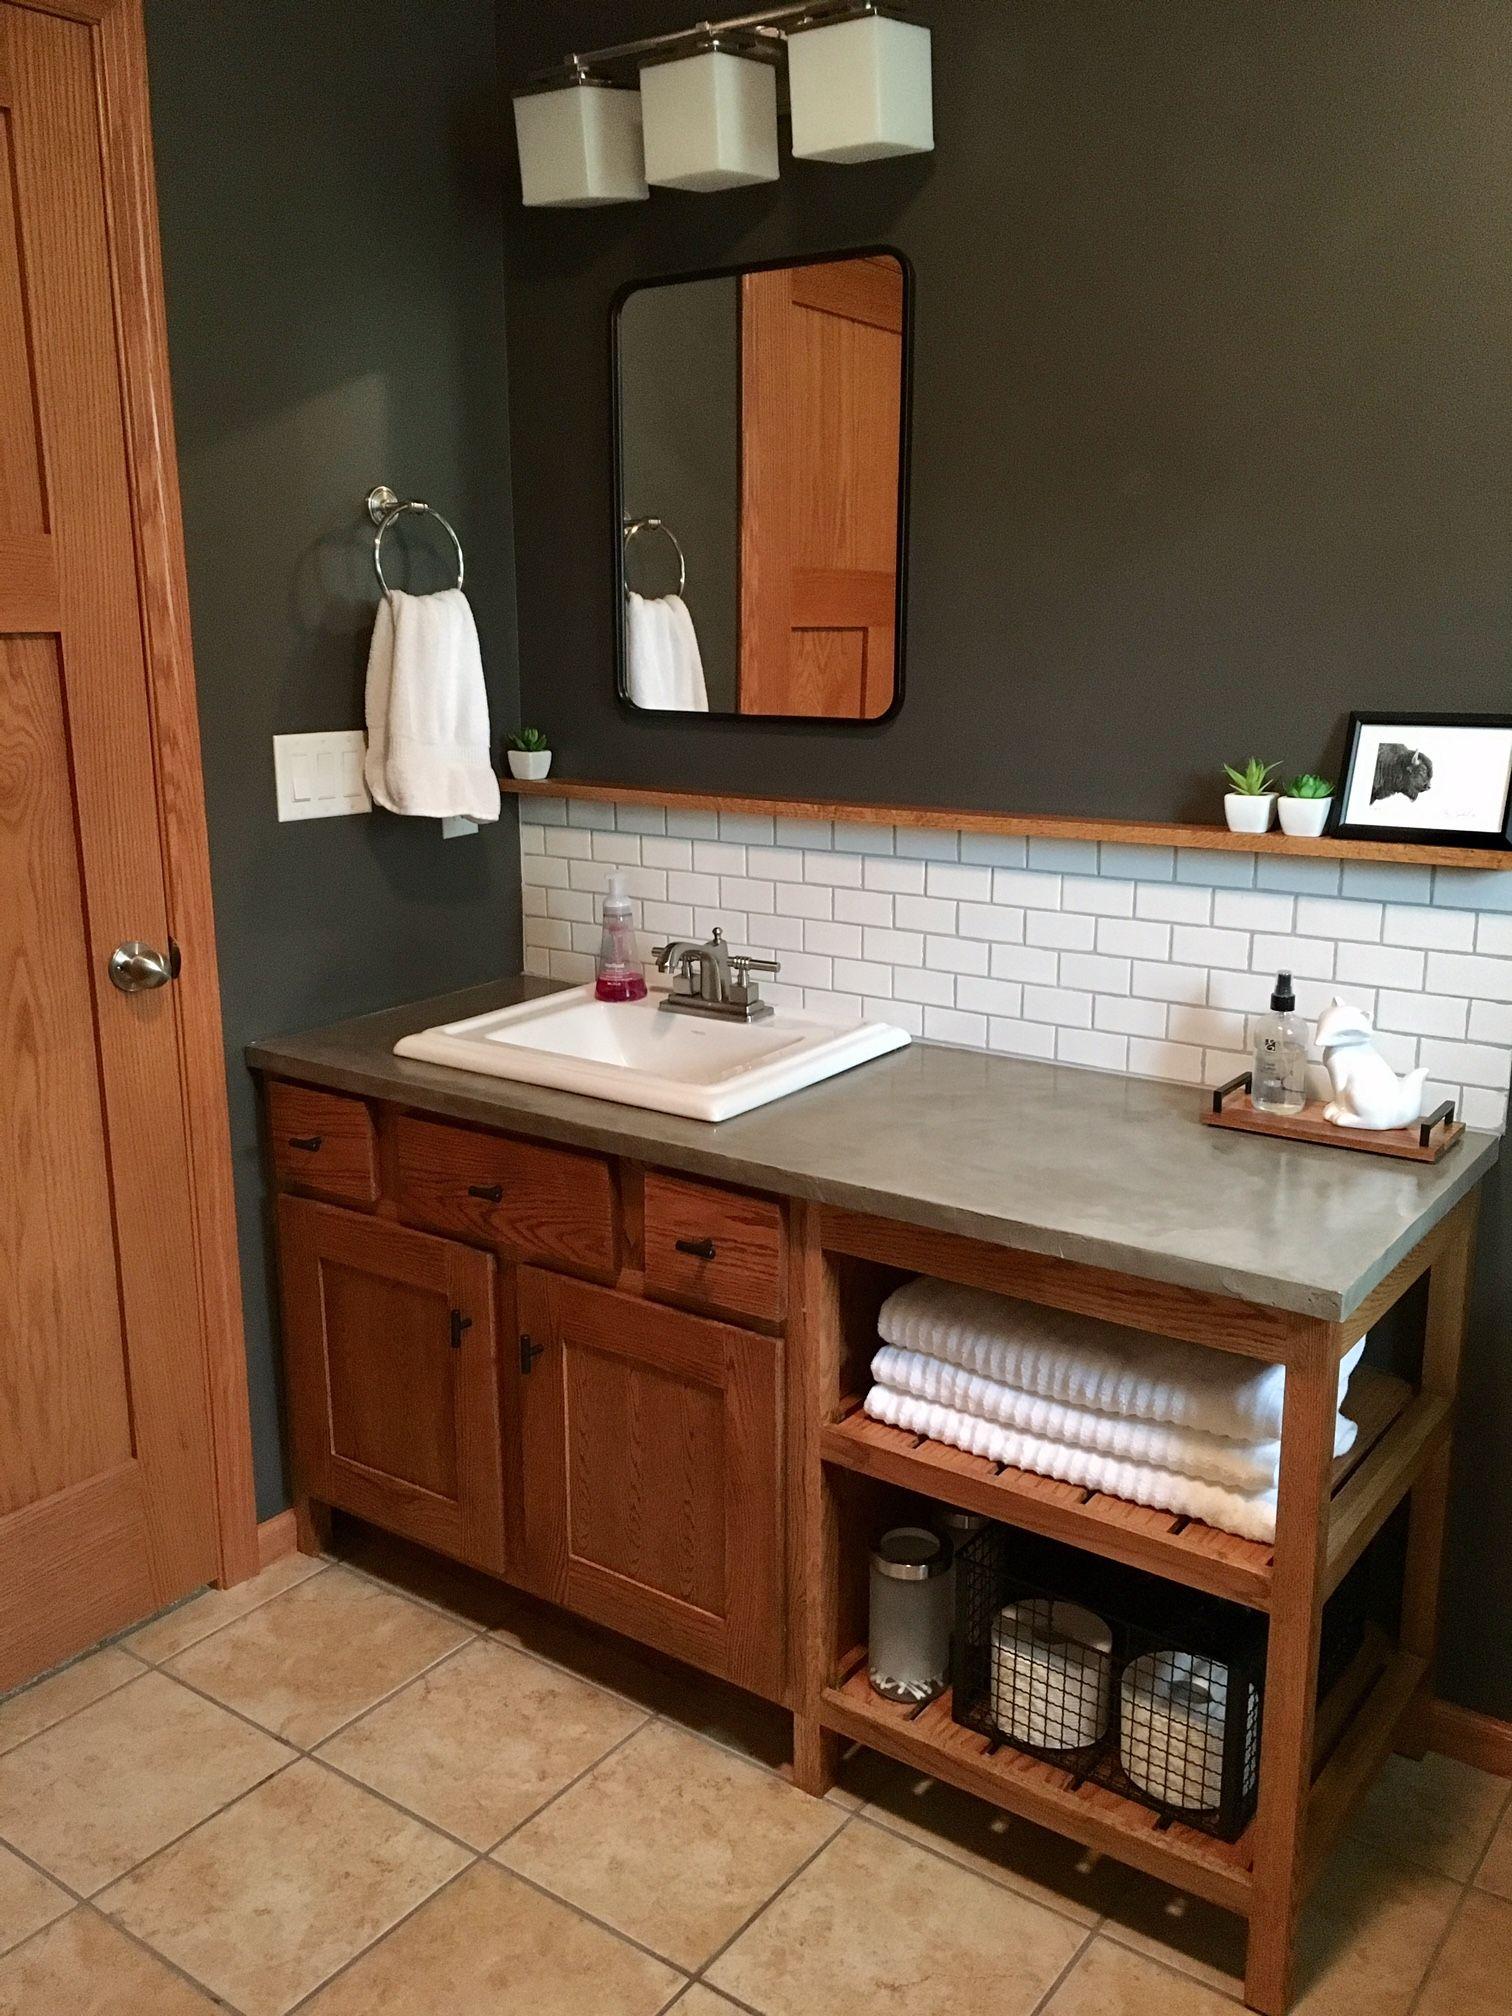 Concrete Overlay On Bathroom Countertop Using Ardex